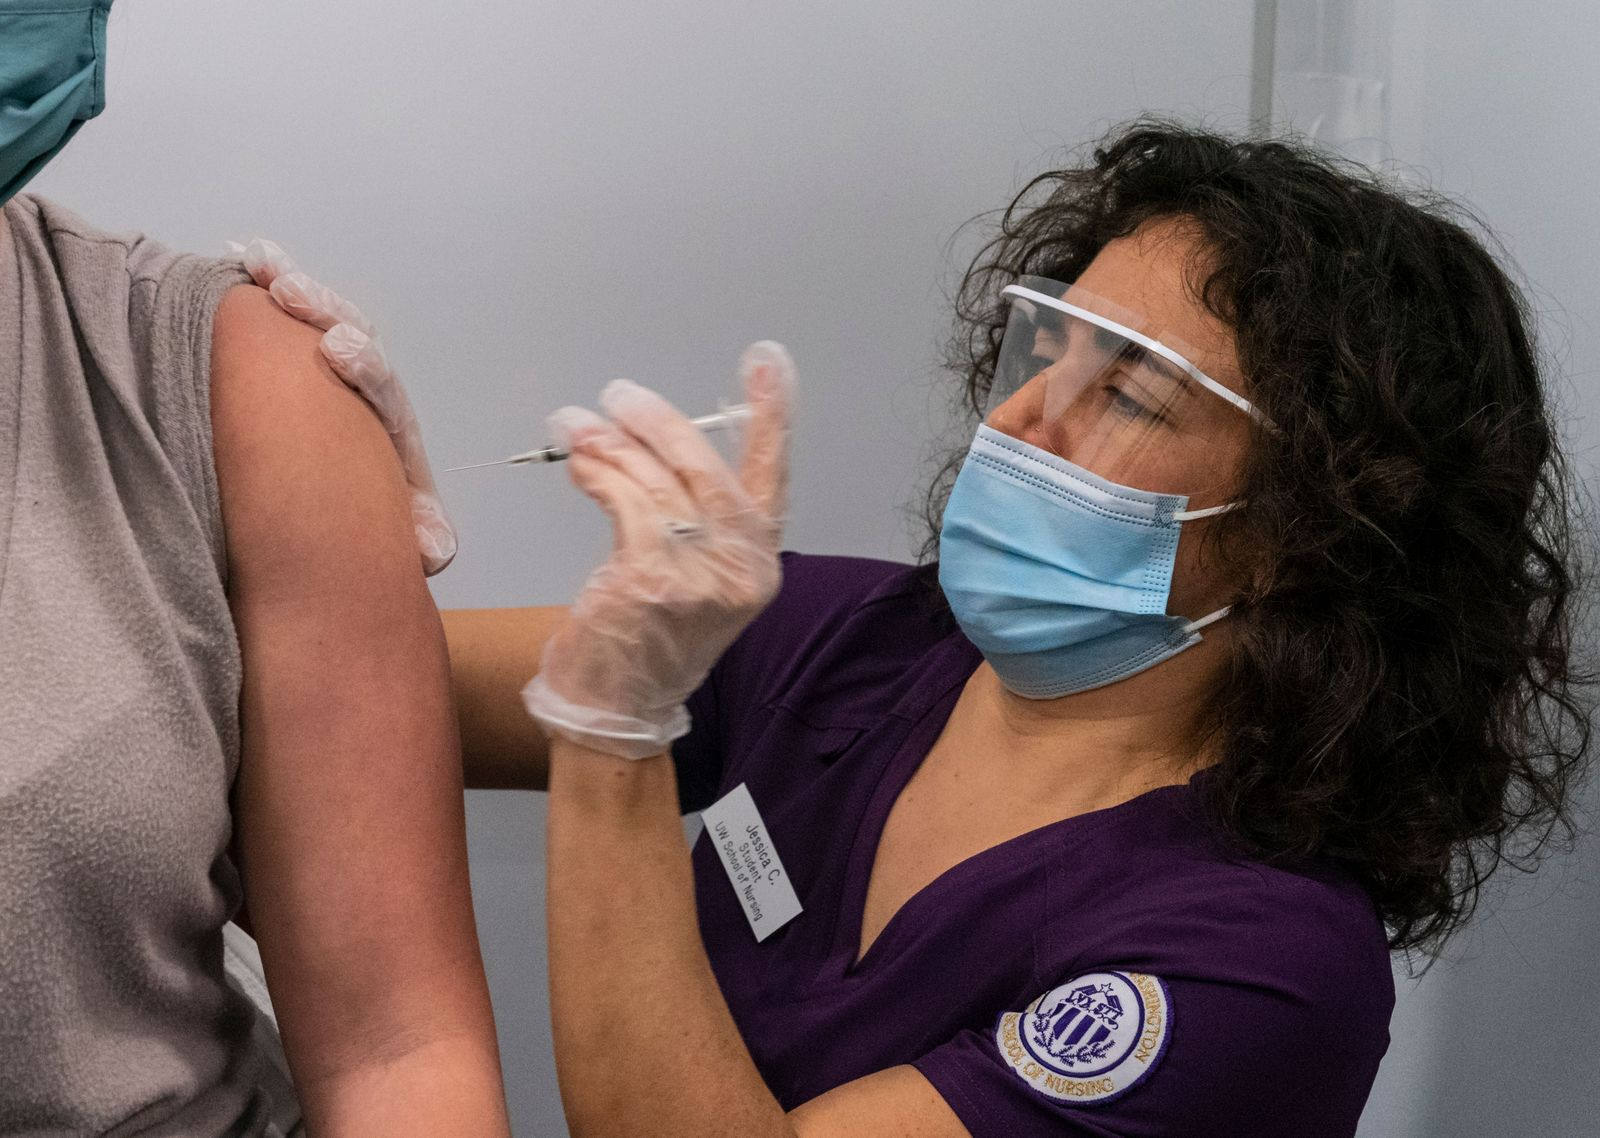 Frontline healthcare workers receive the Pfizer-BioNTech coronavirus vaccine, Seattle, USA - 18 Dec 2020